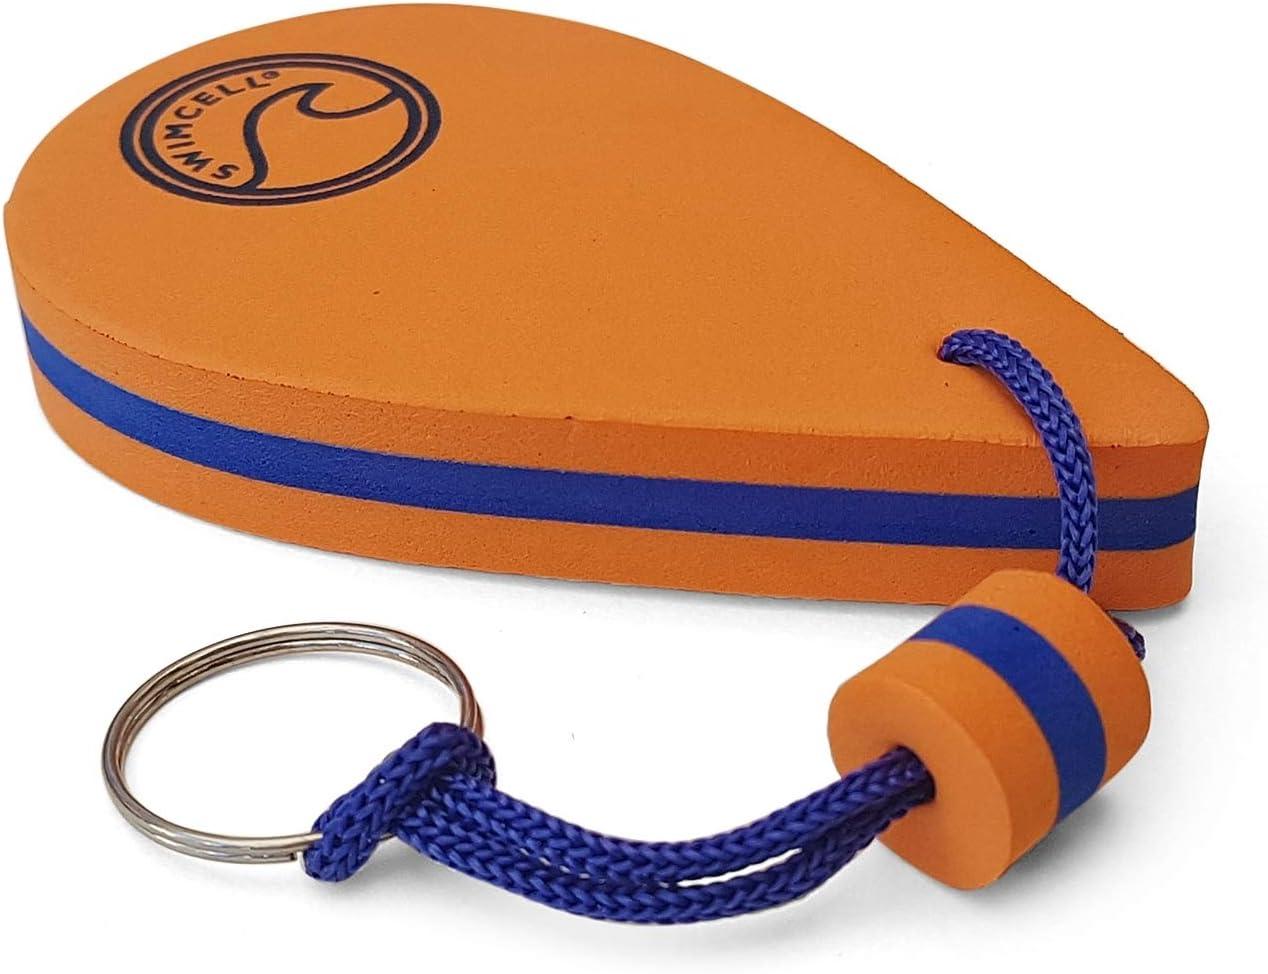 Llavero Flotante SwimCell para Llaves con Adici/ón de Llavero Abridor de Botellas Usar para Llaves o para hacer flotar un m/óvil dentro de una Funda SwimCell 100/% Impermeable 6cm x 10cm